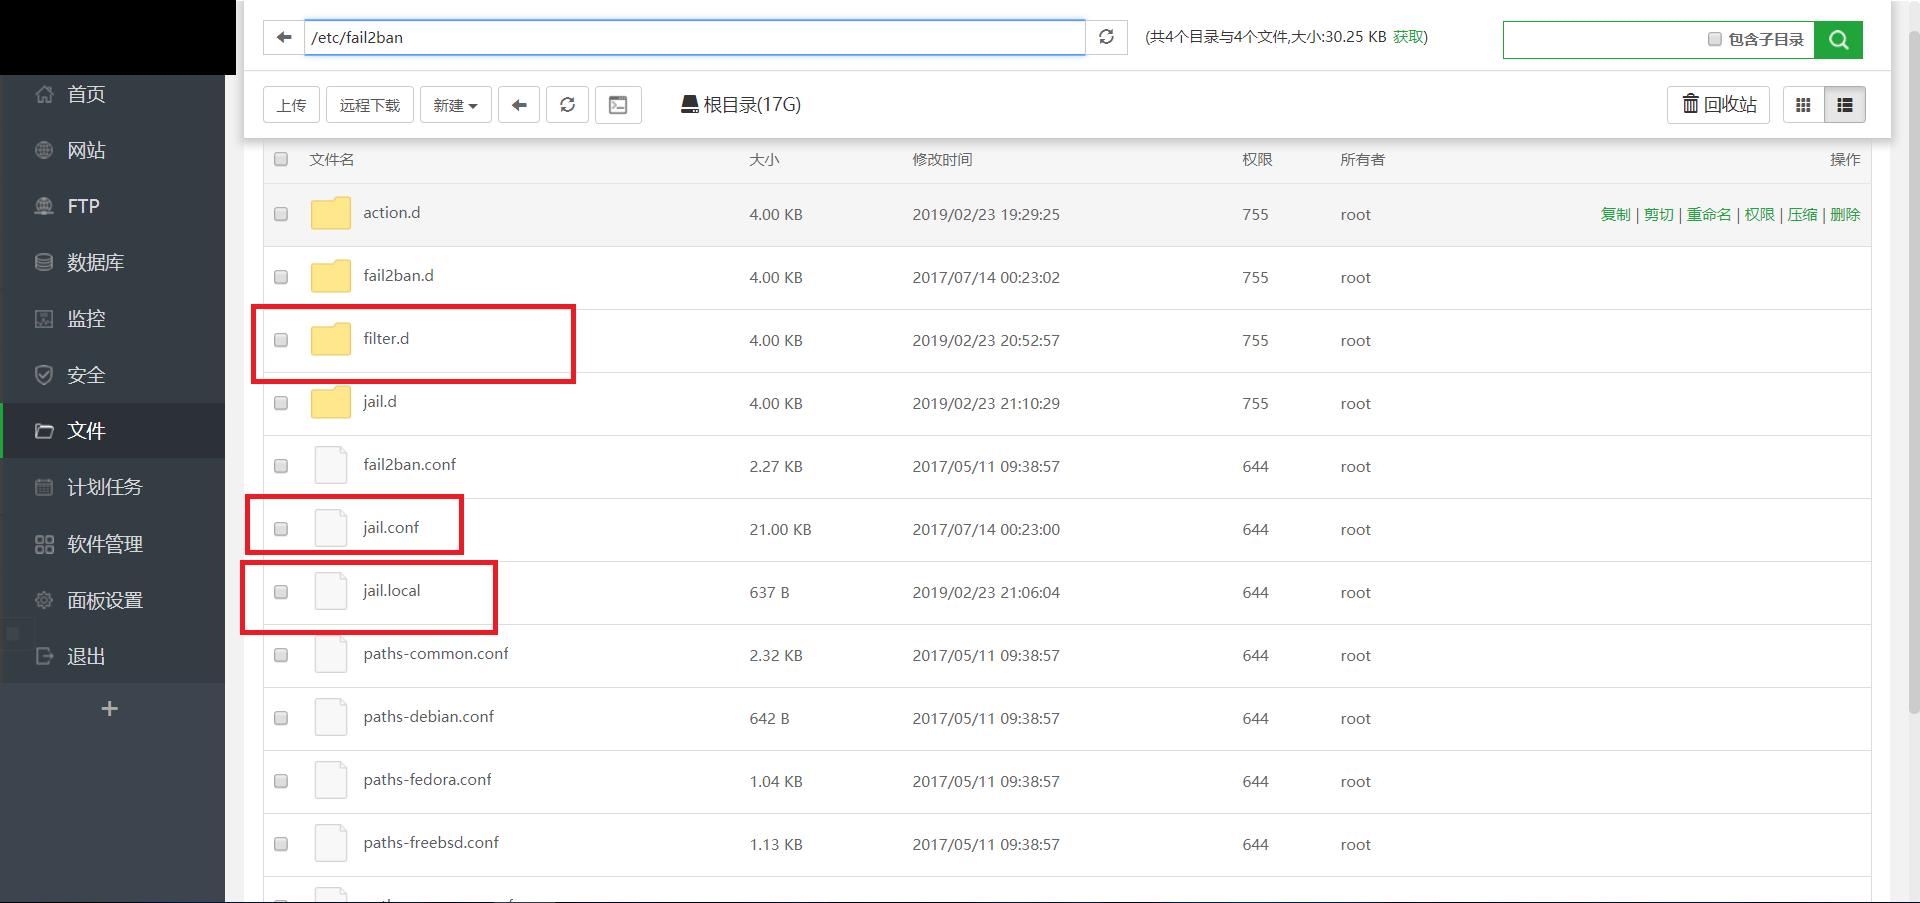 【vps安全防护】CentOS 7+宝塔面板_安装Fail2Ban+Firewalld,用来防止SSH爆破和CC攻击